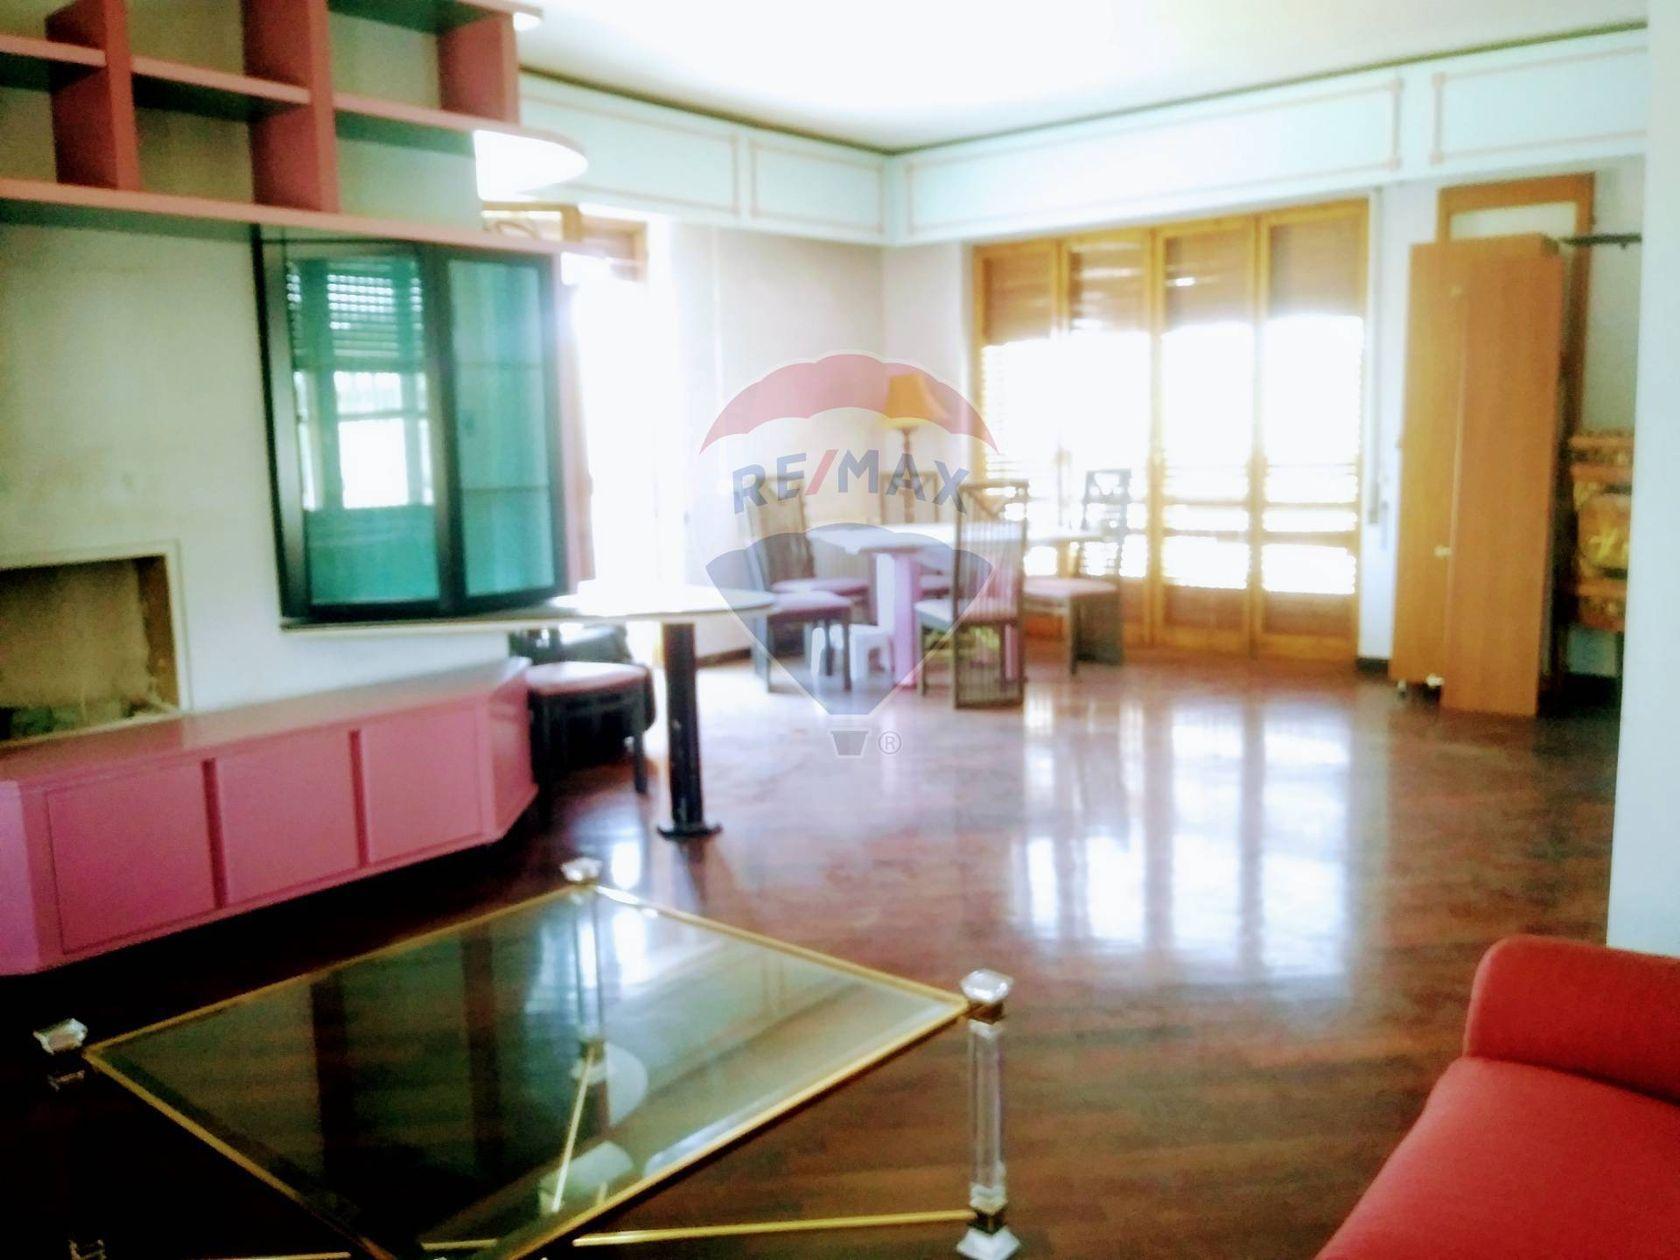 Villa singola S. Pasquale, Bari, BA Vendita - Foto 9